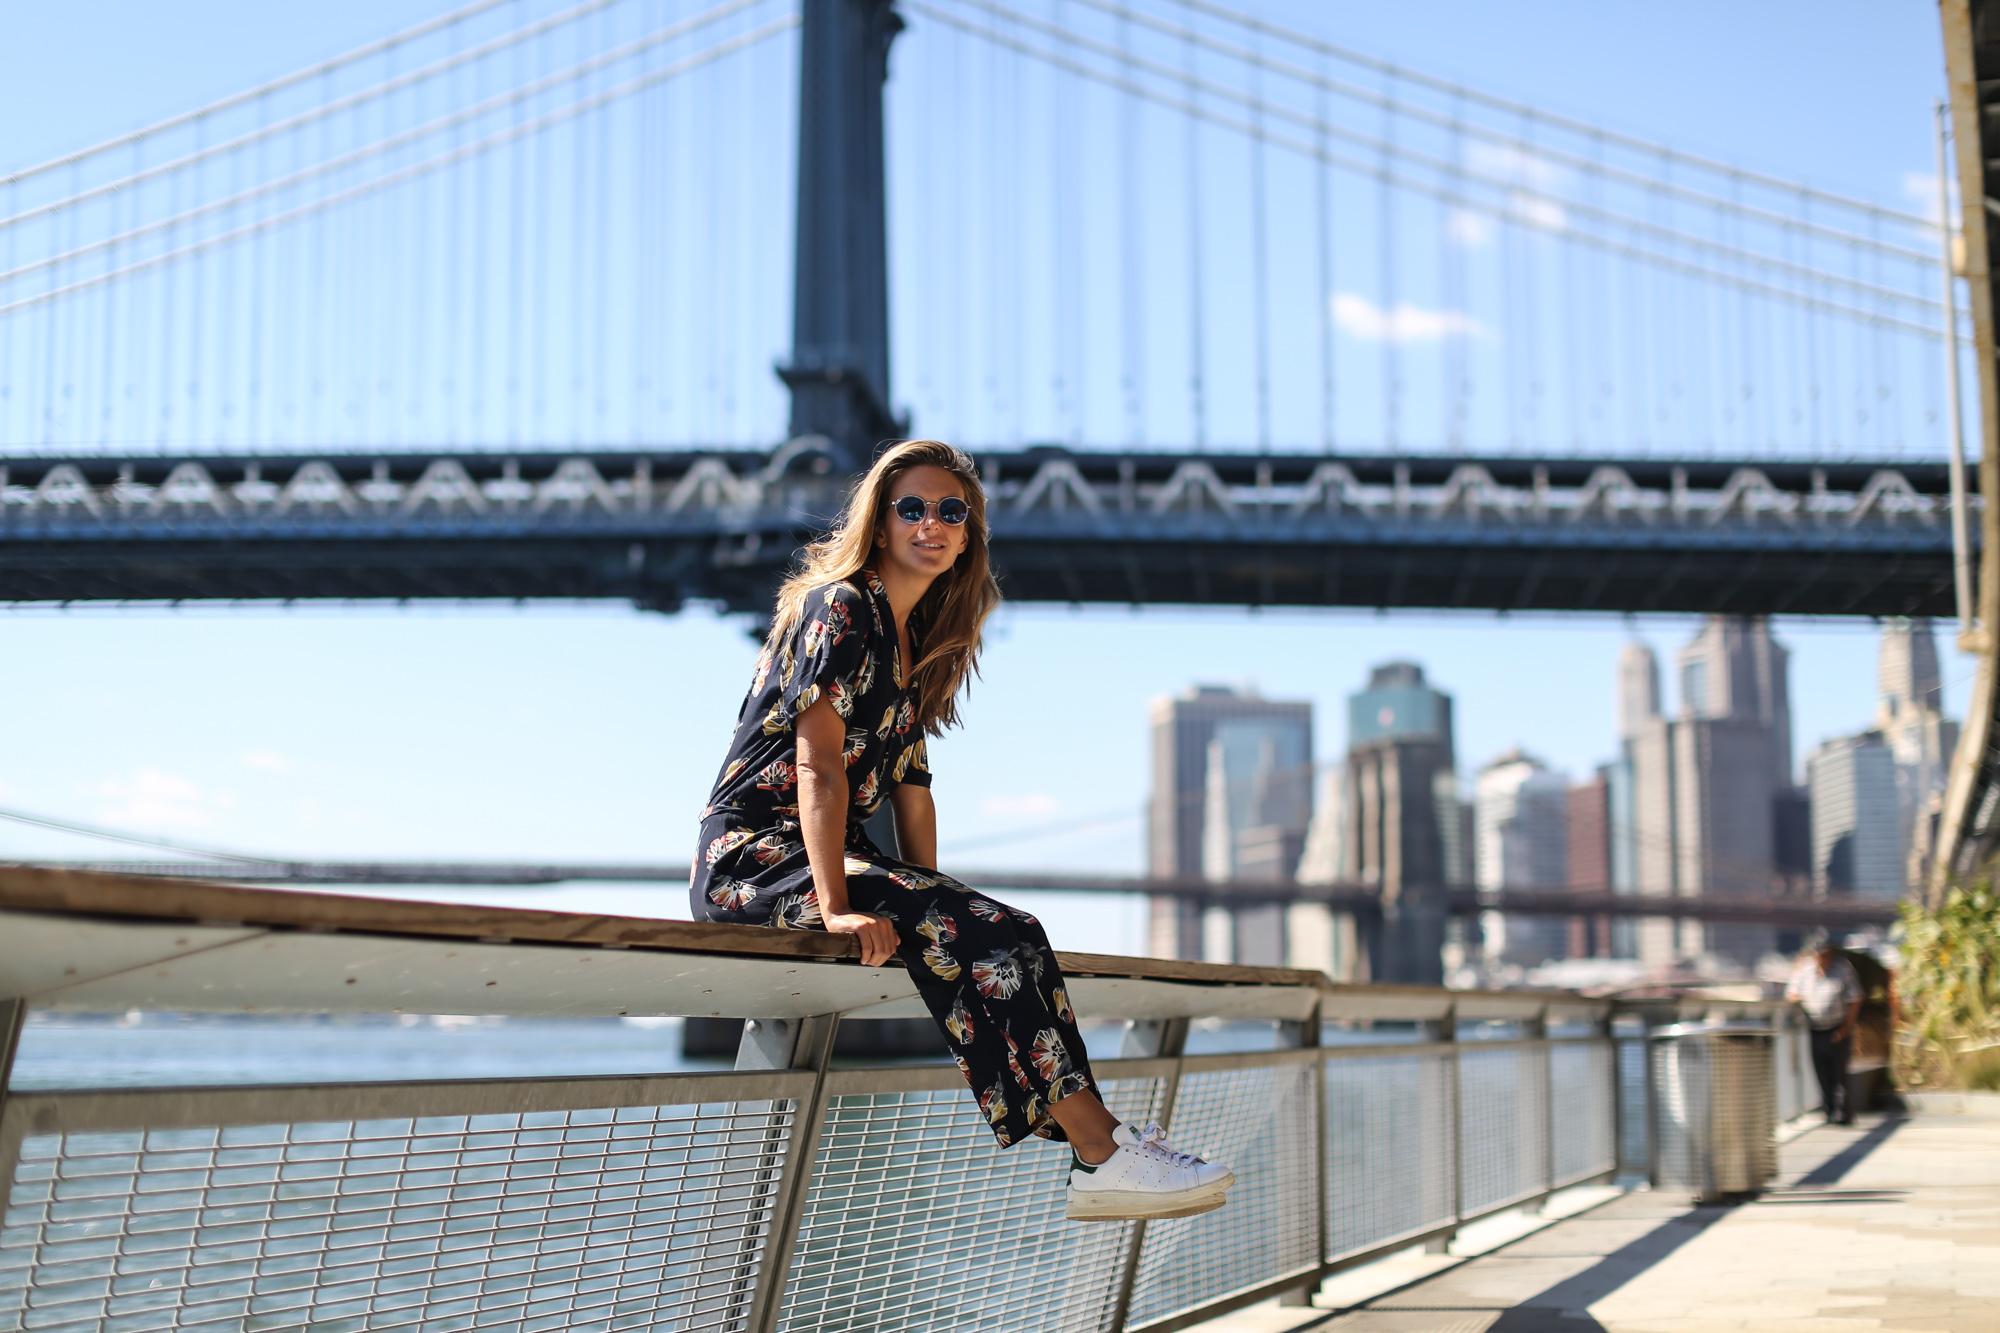 Clochet_streetstyle_nyfw_newyorkfashionweek_zara_floral_jumpsuit_adidas_stansmith